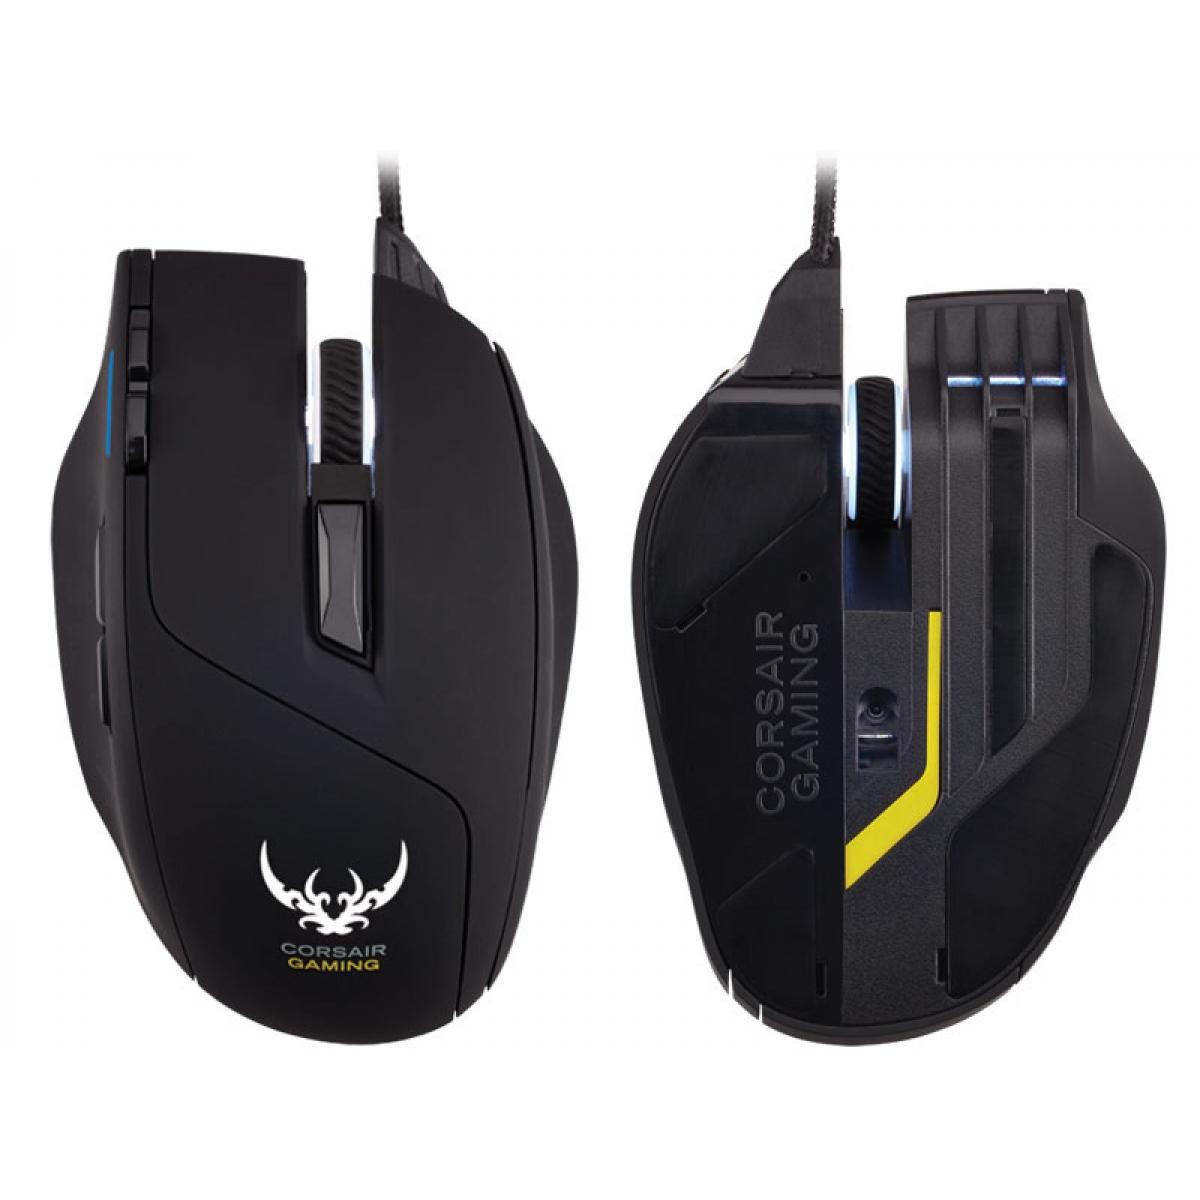 Mouse Corsair Gamer Sabre RGB Led Customizável 8 Botões 8.200 DPI Black